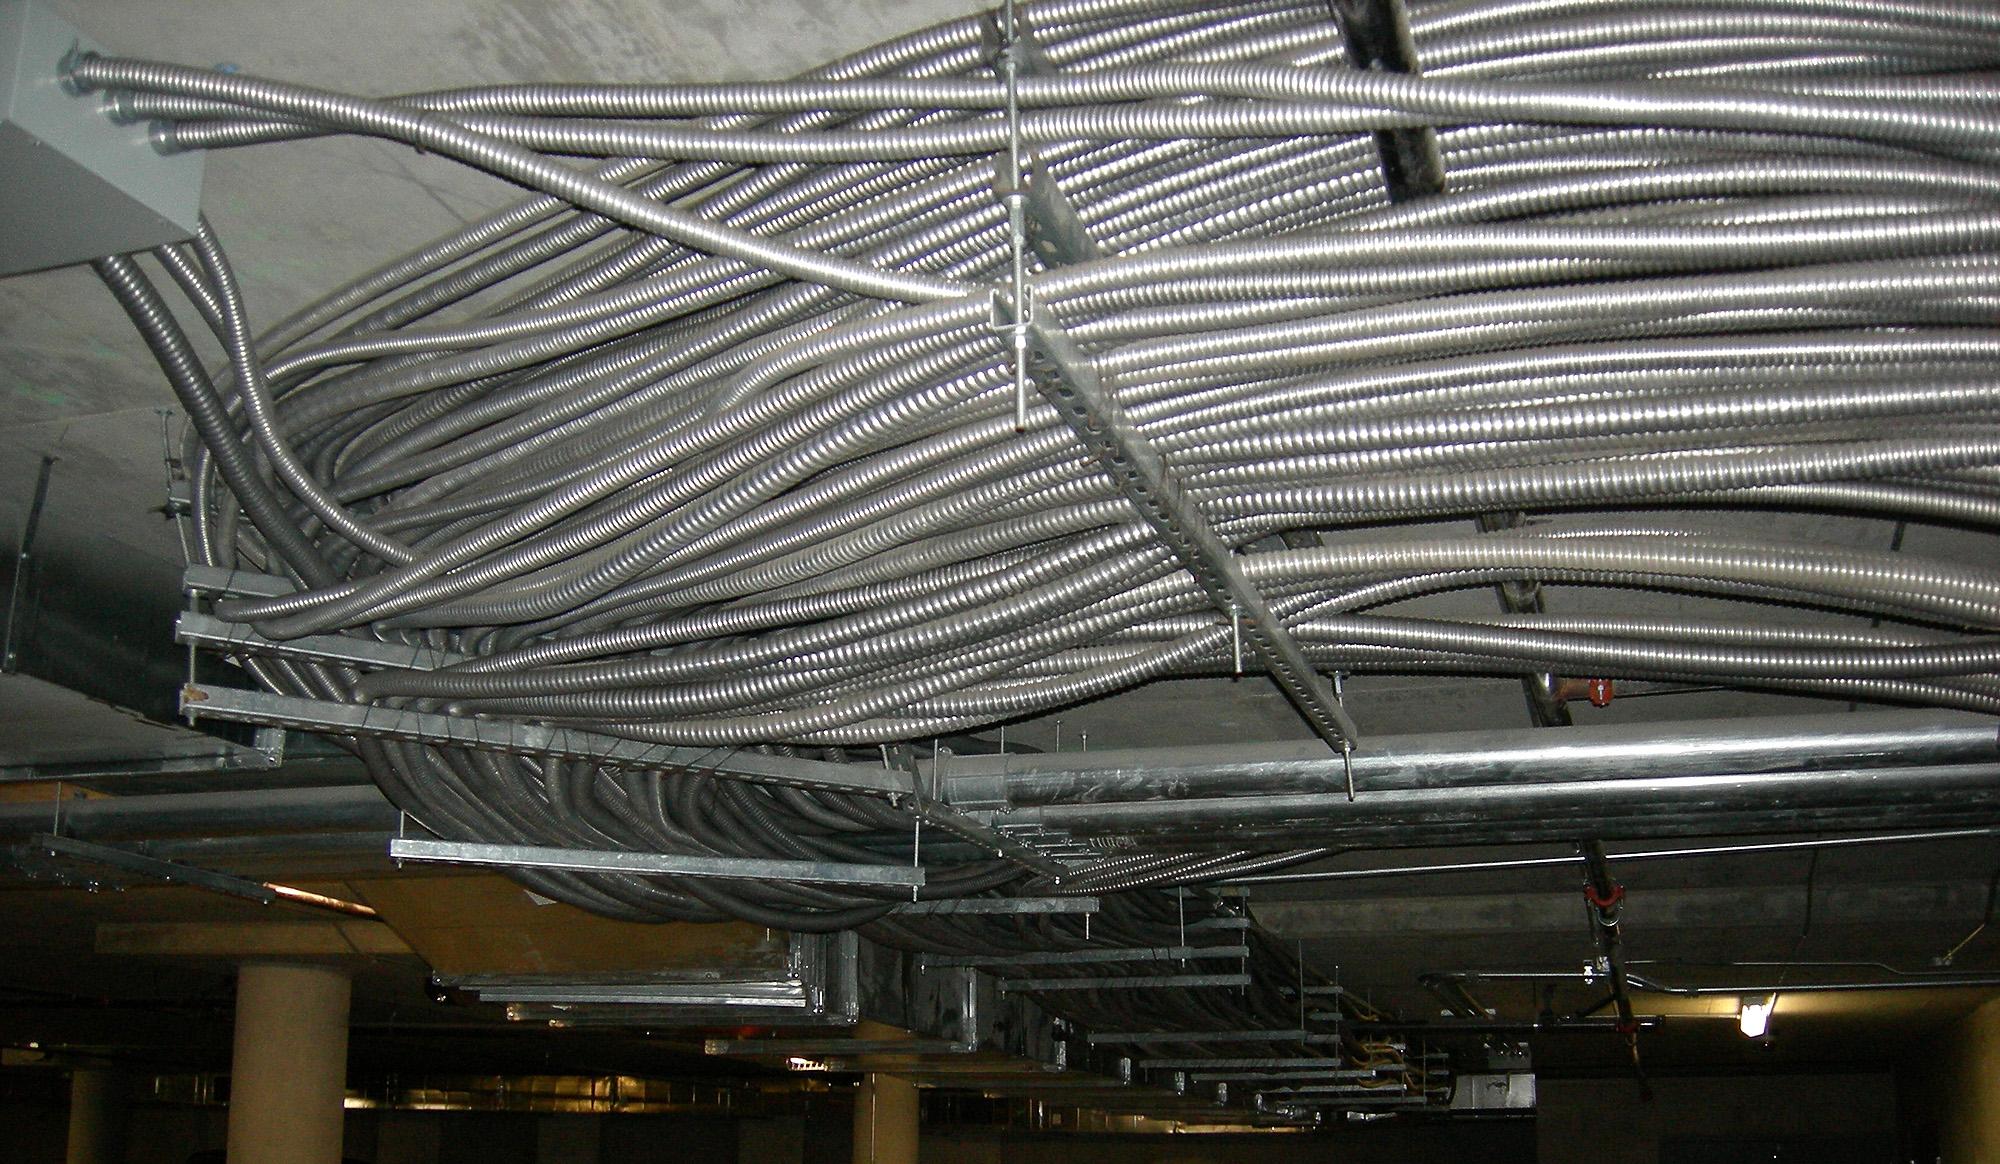 Thread Wiring Recessed Lighting In Basement